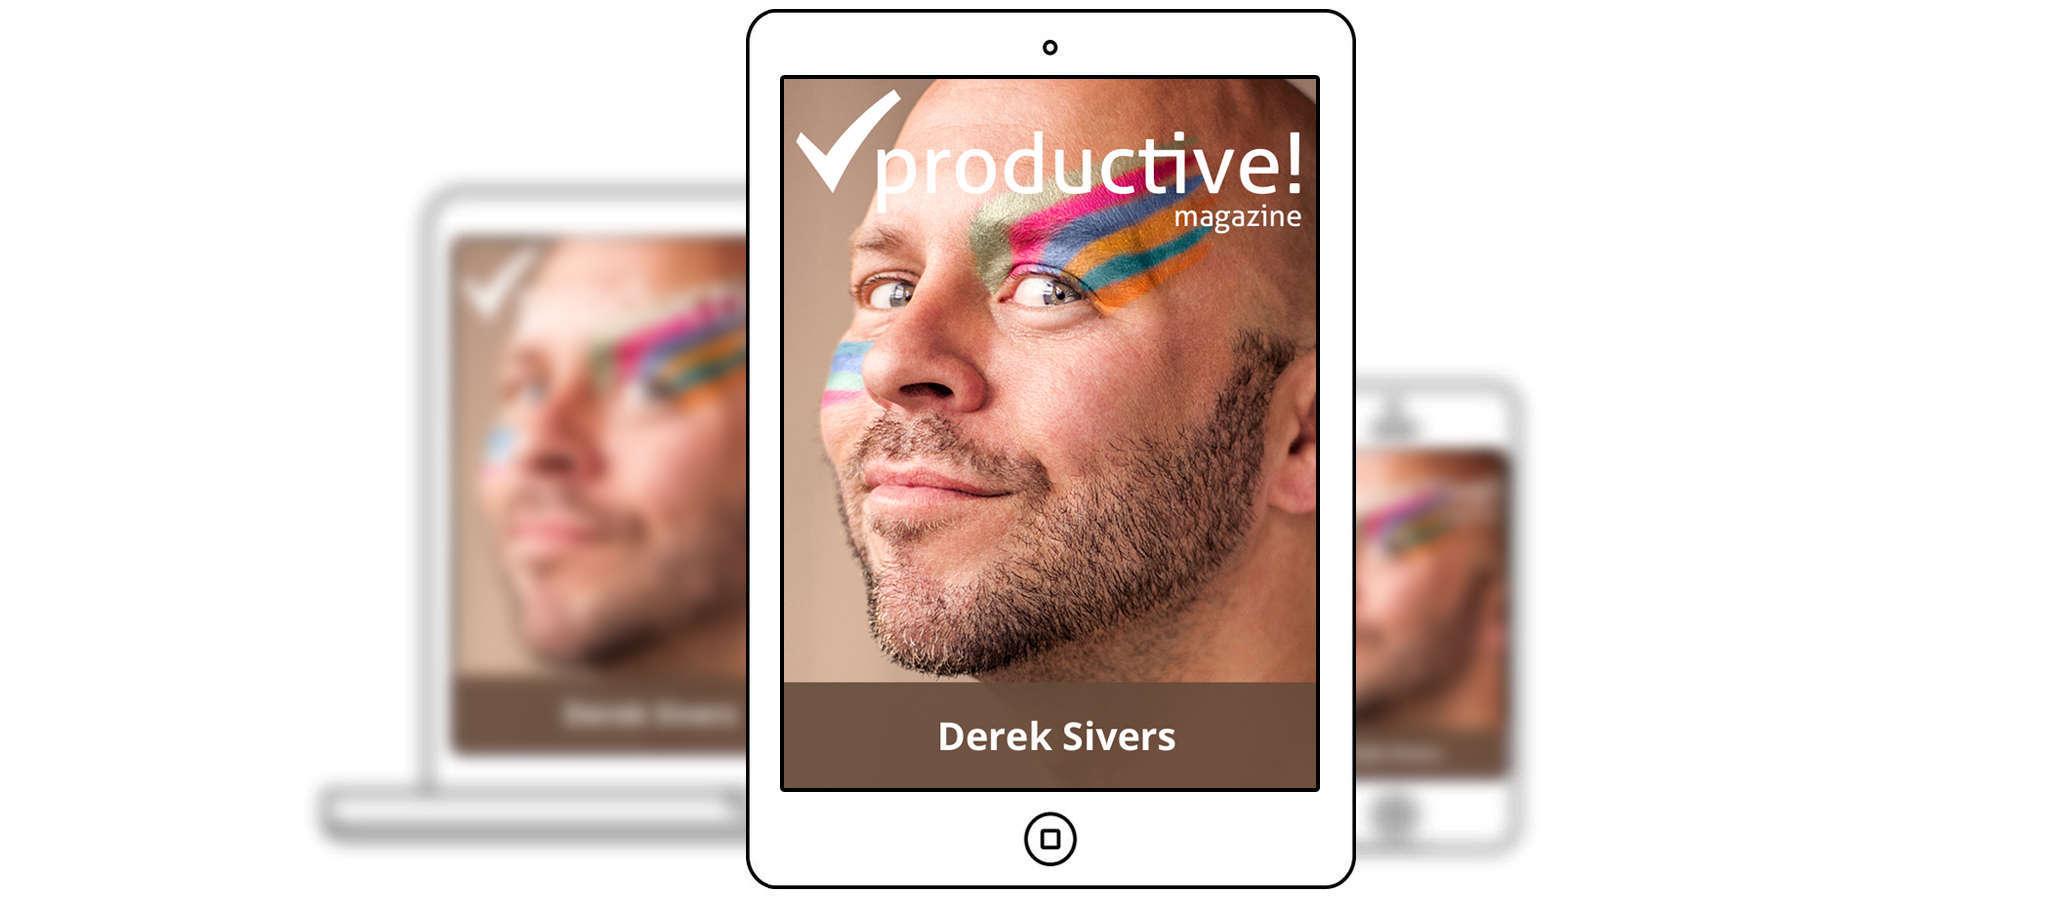 №30 with Derek Sivers